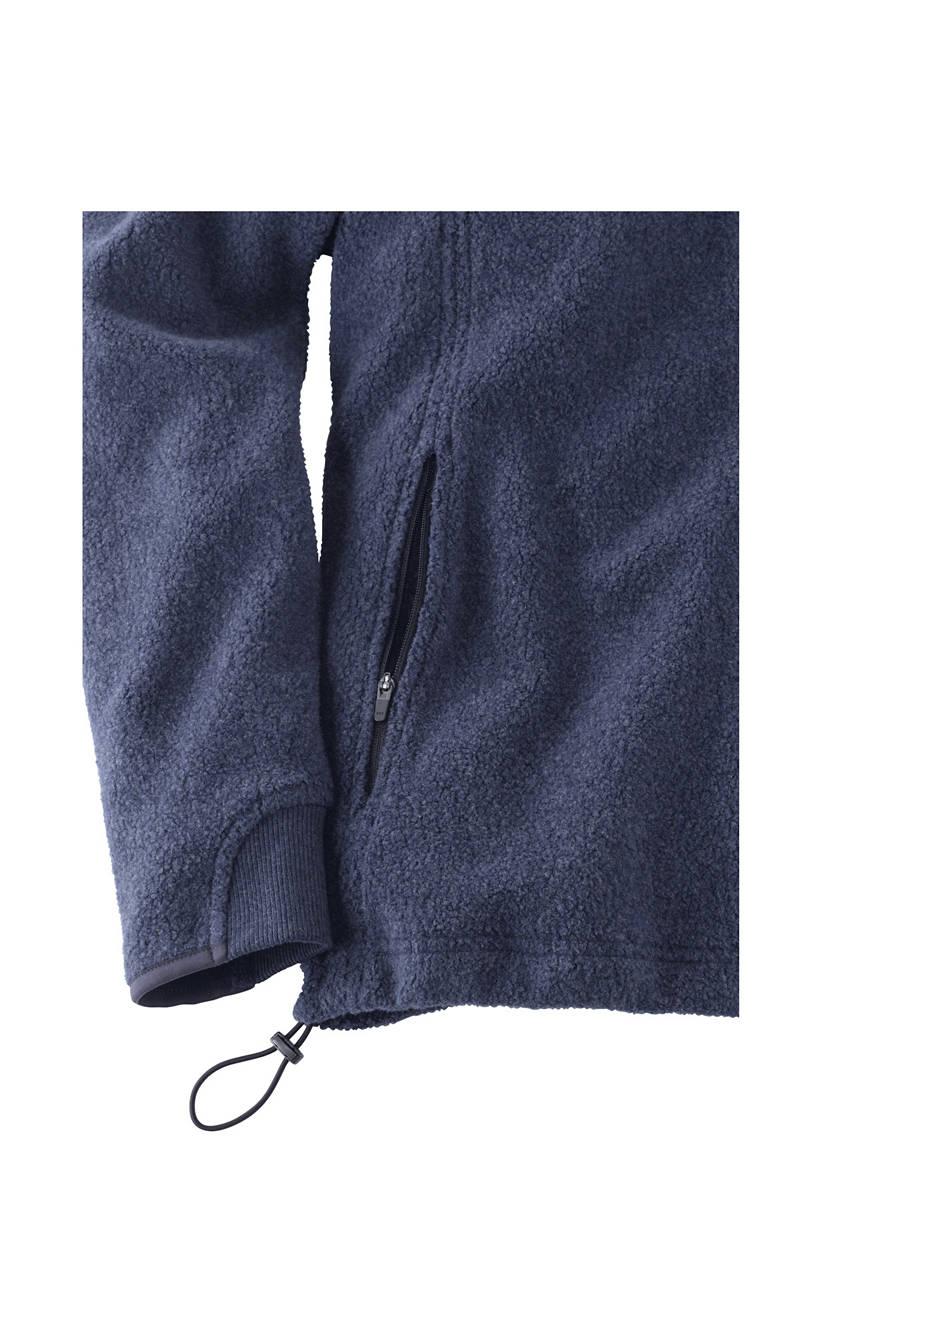 Herren Fleece-Kapuzenjacke aus reiner Bio-Baumwolle